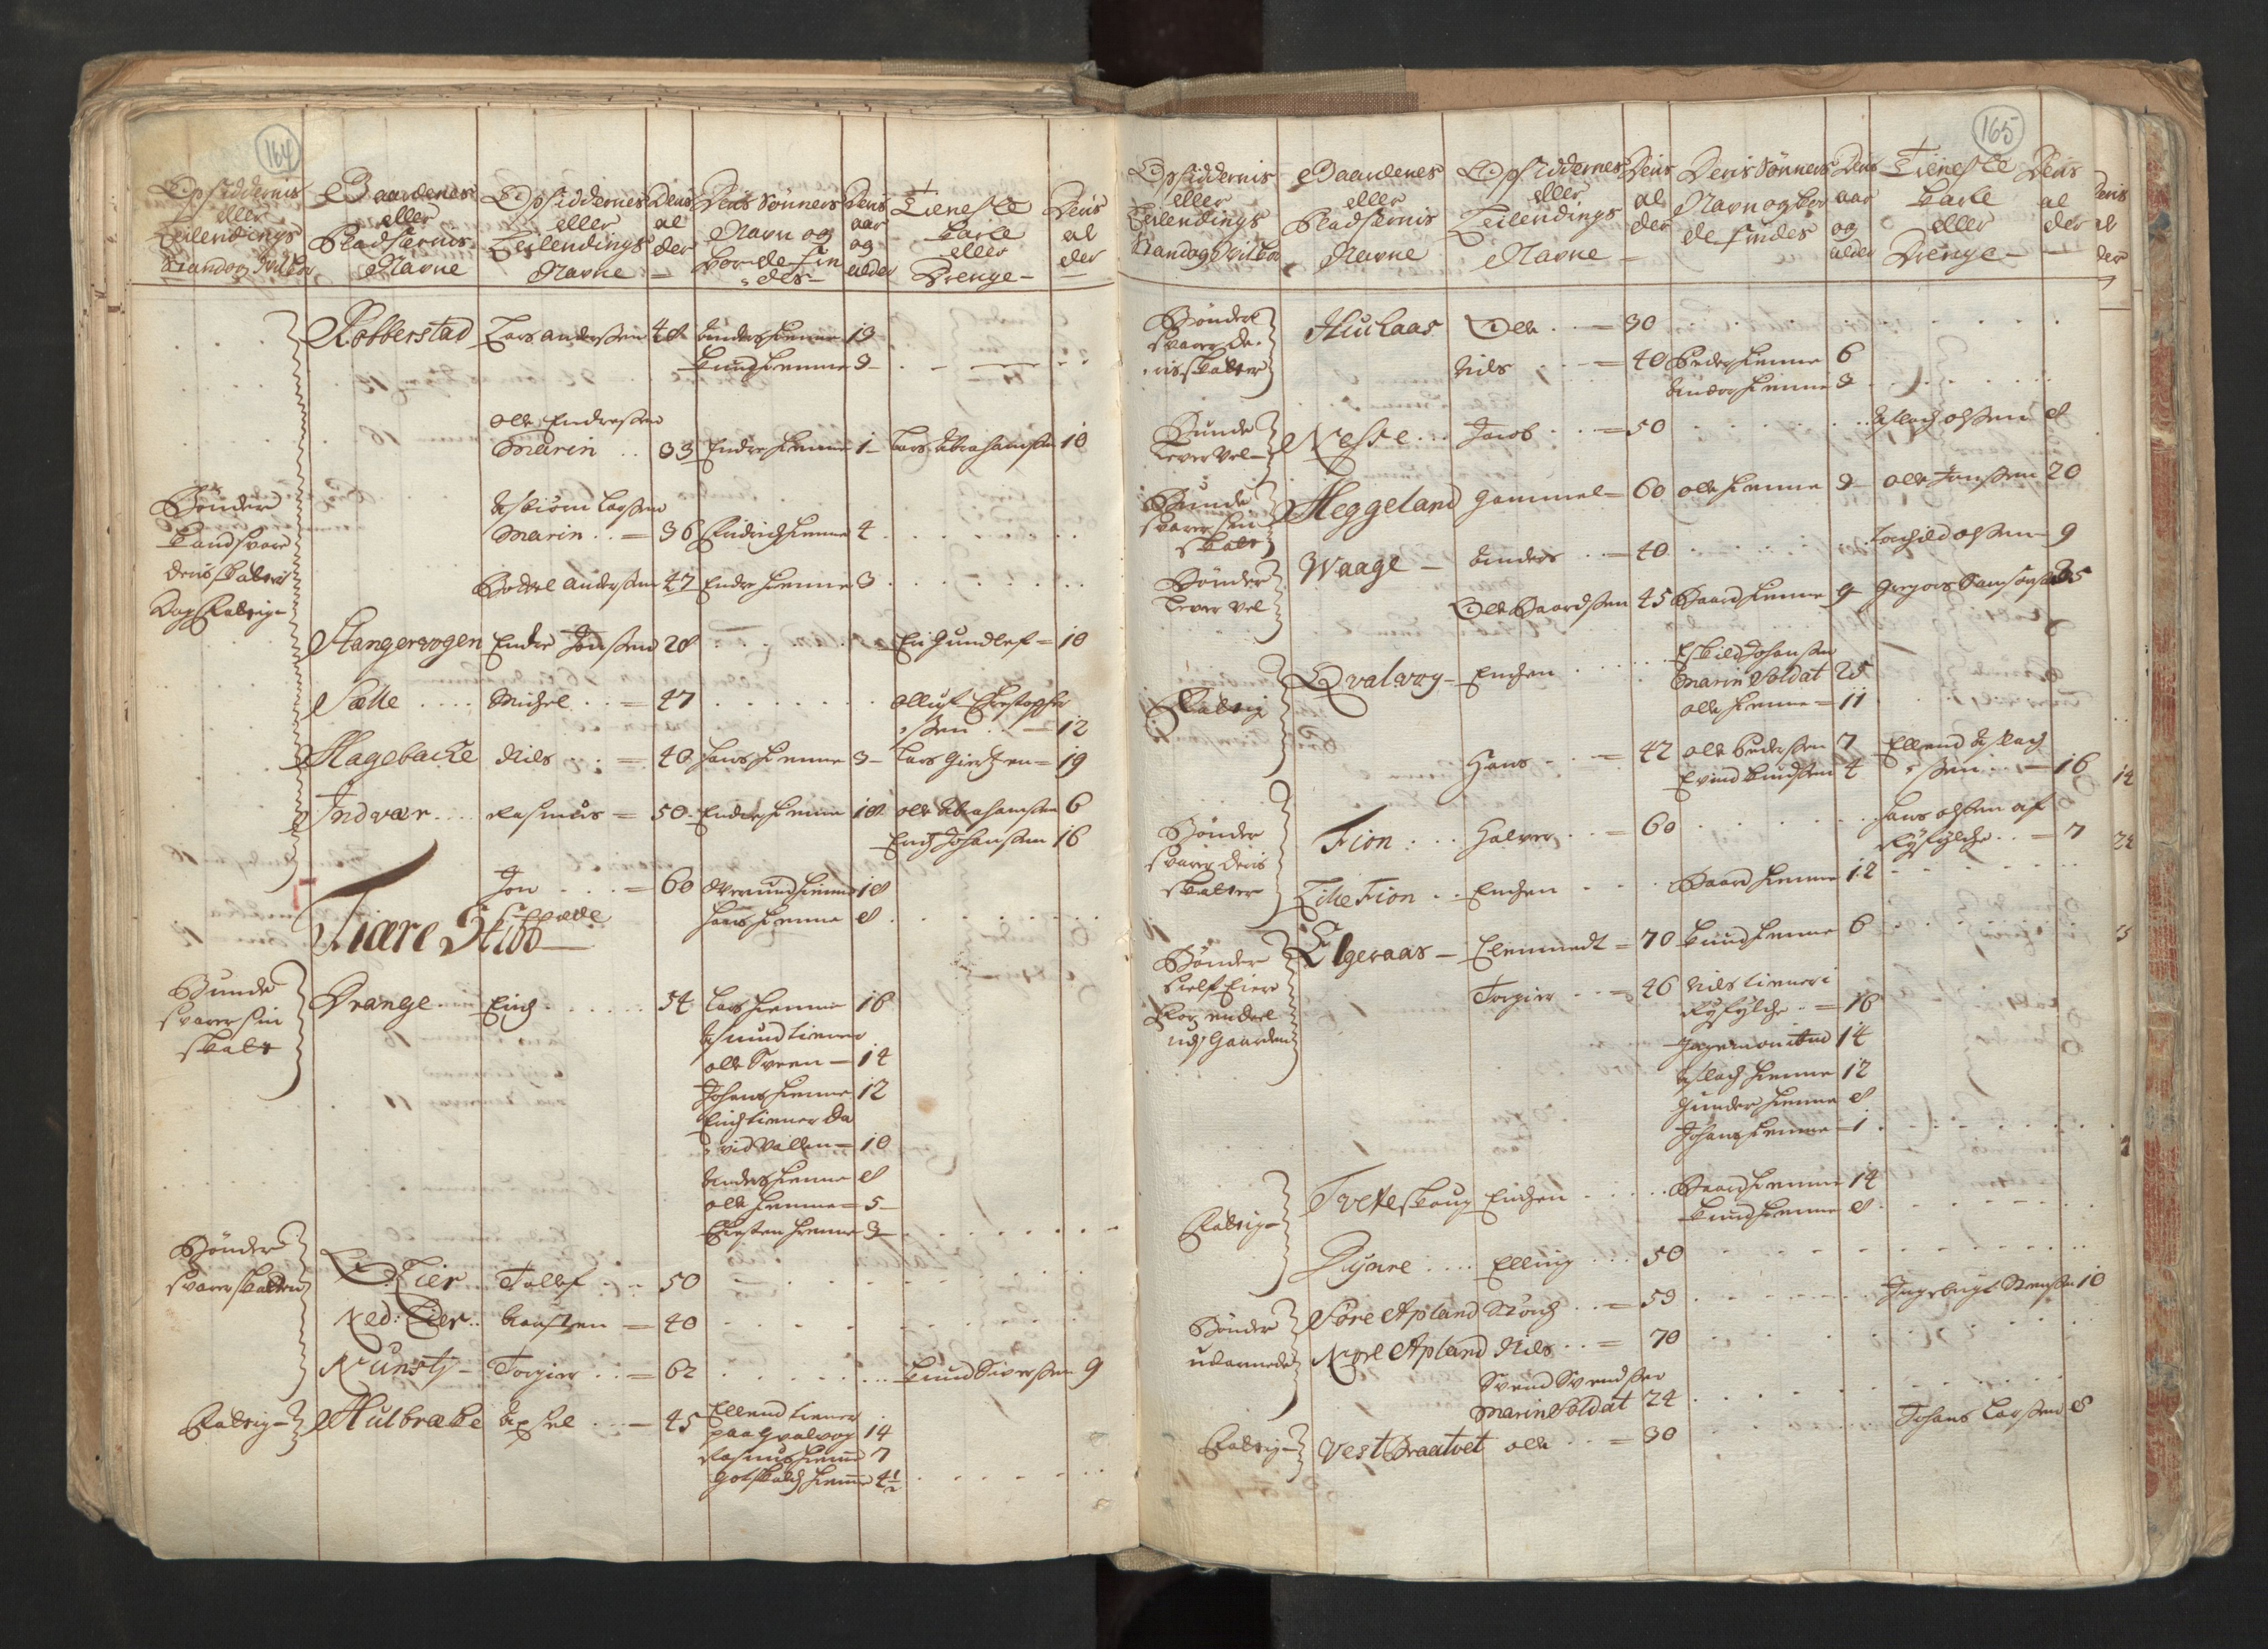 RA, Manntallet 1701, nr. 6: Sunnhordland fogderi og Hardanger fogderi, 1701, s. 164-165